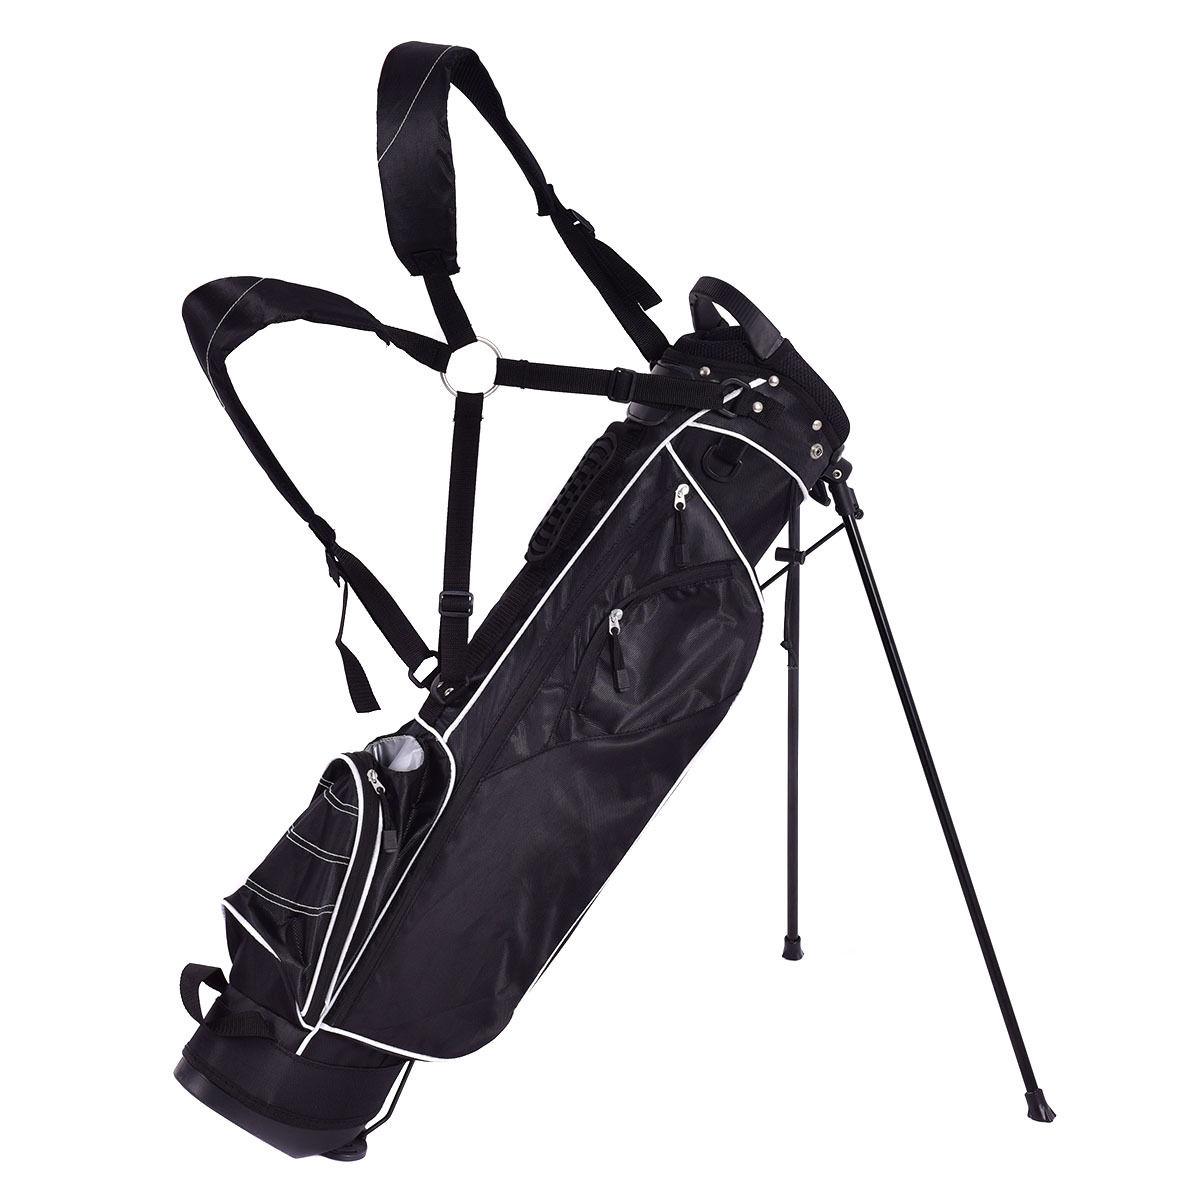 Golf Stand Cart Bag w/ 4 Way Divider Carry Organizer Pockets-Black